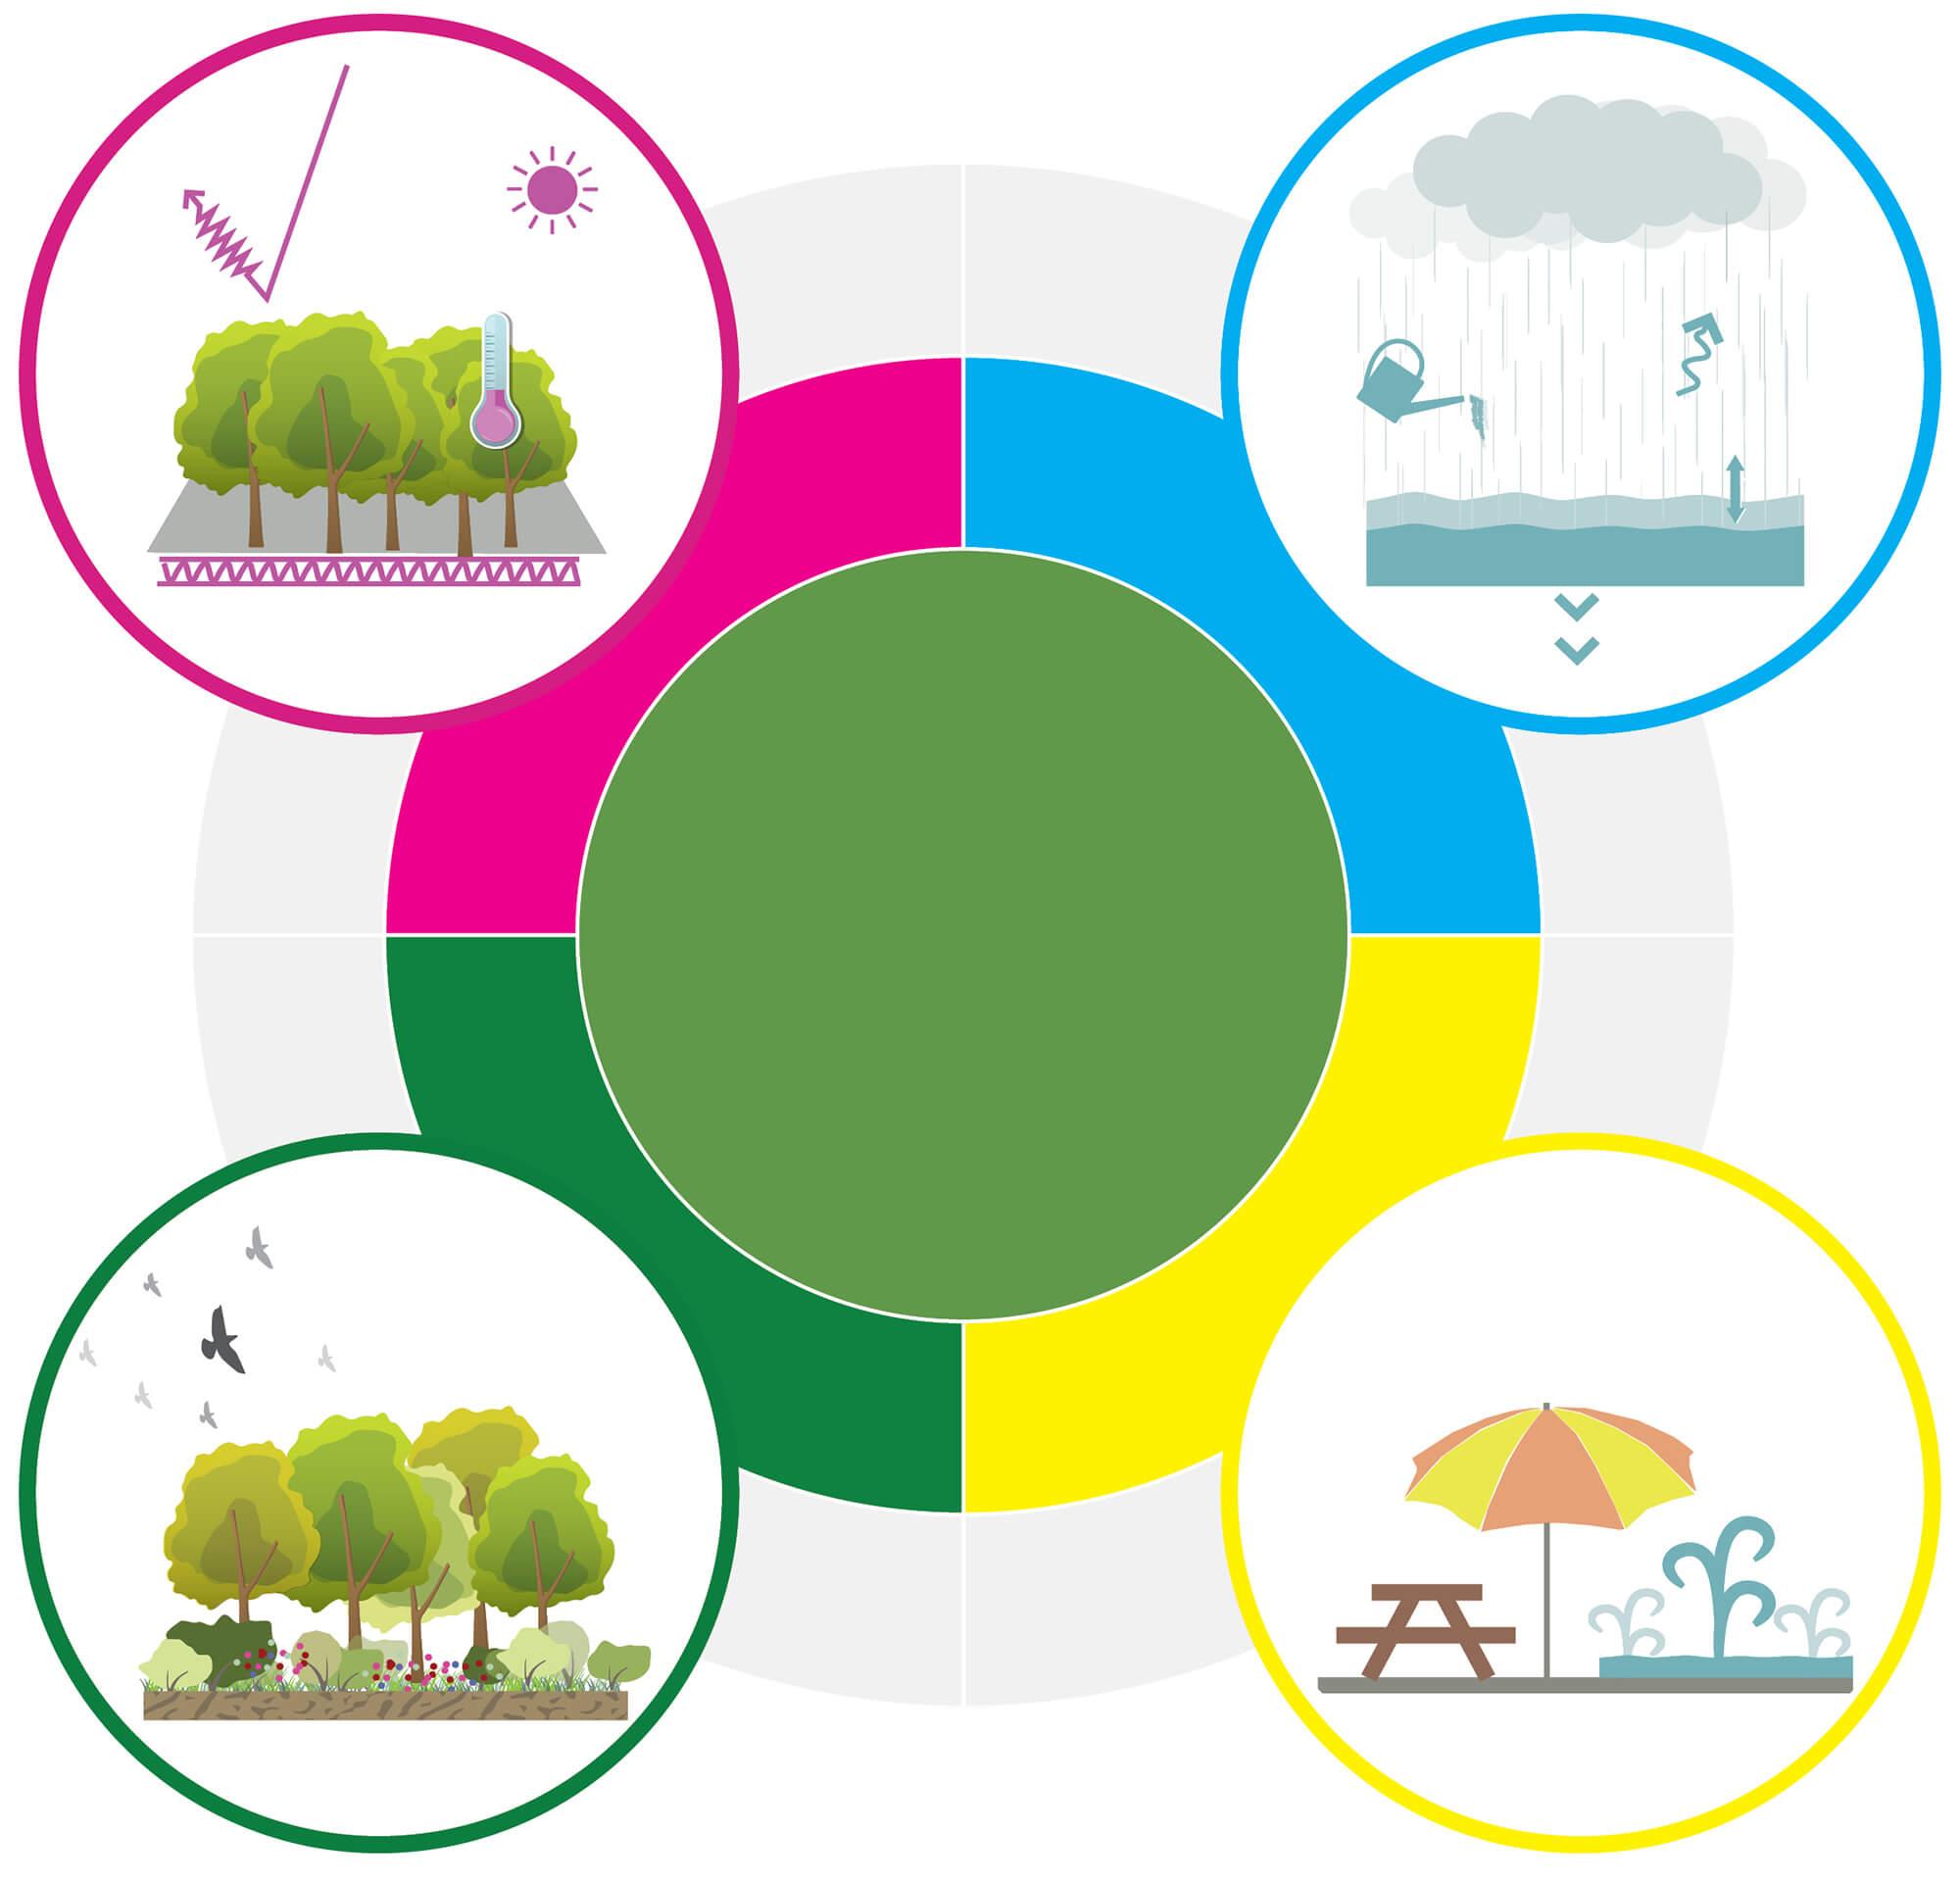 felixx-greenicons-conceptdiagram1.jpg